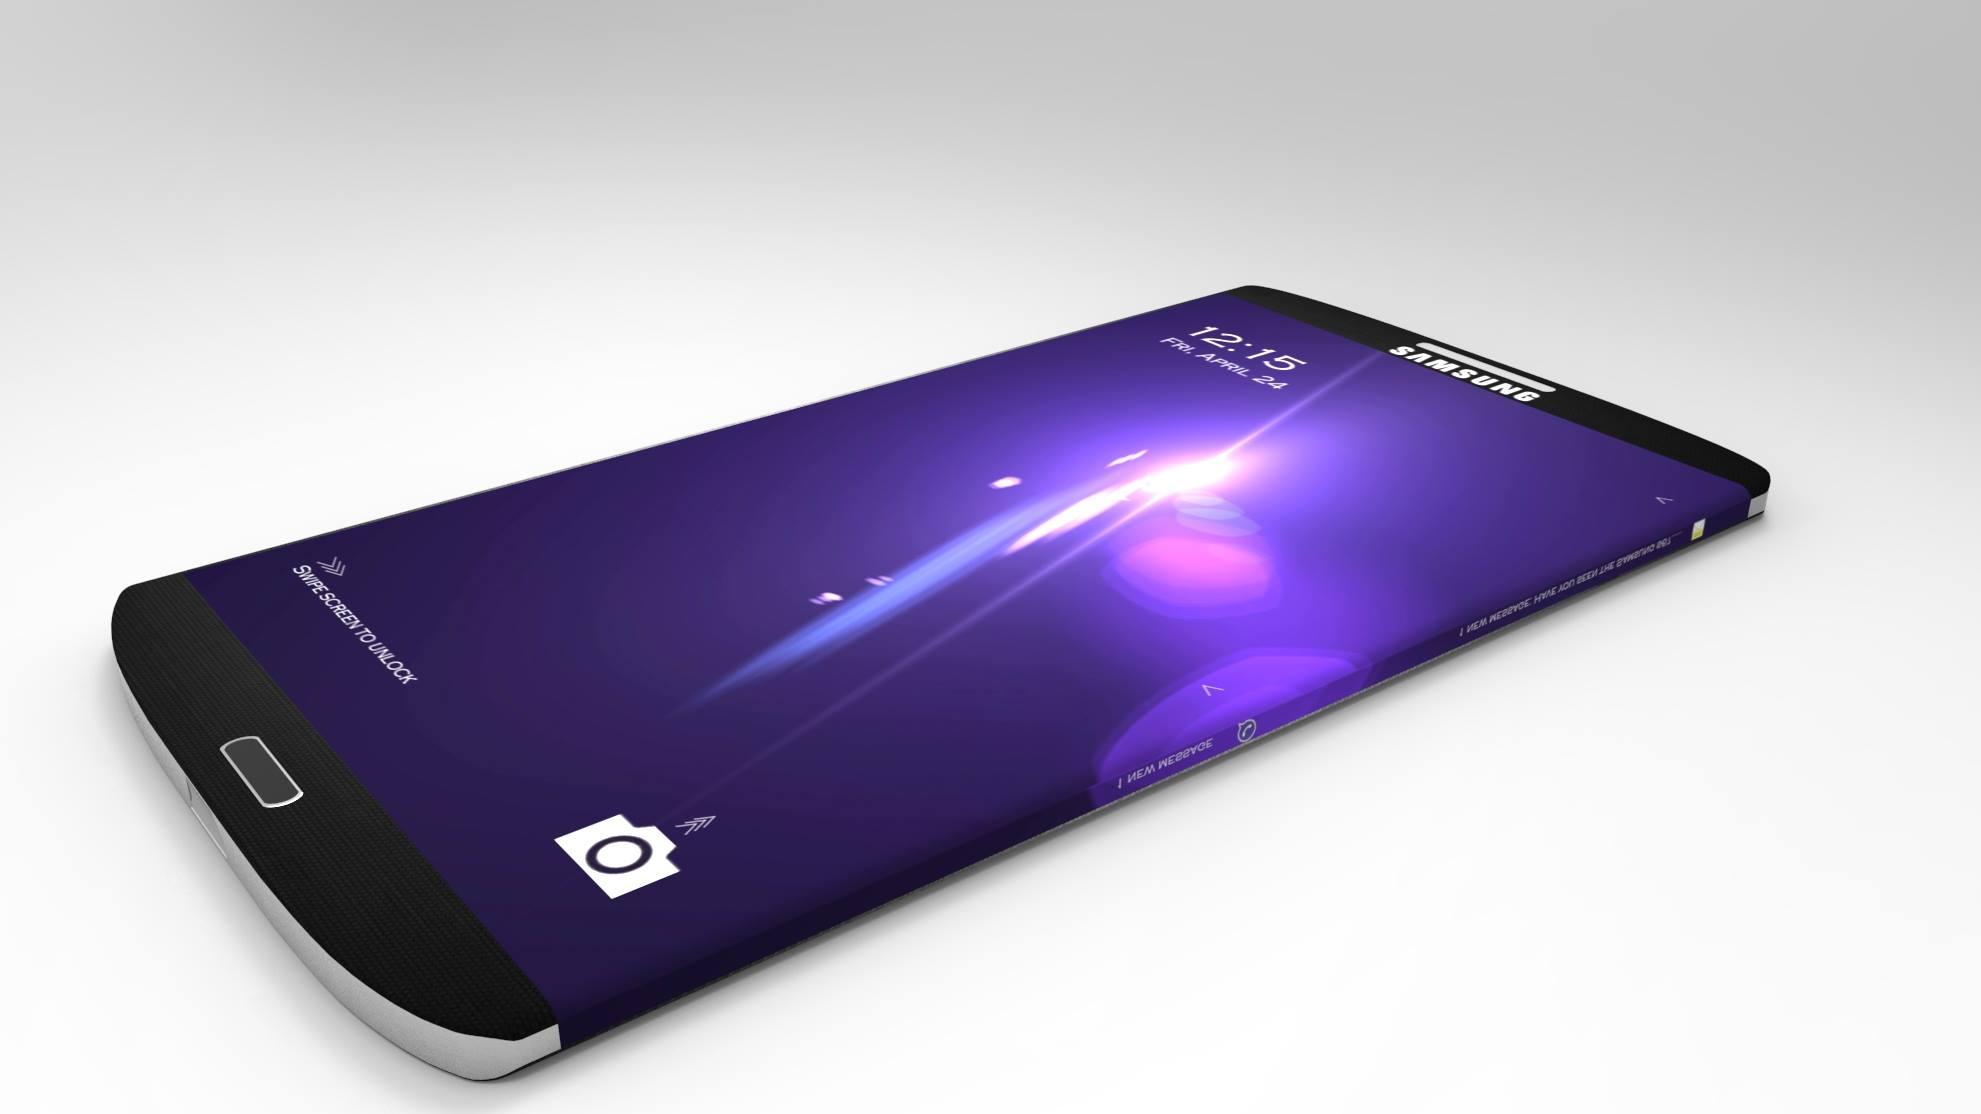 Samsung Galaxy S6 Will Have 4GB Of RAM